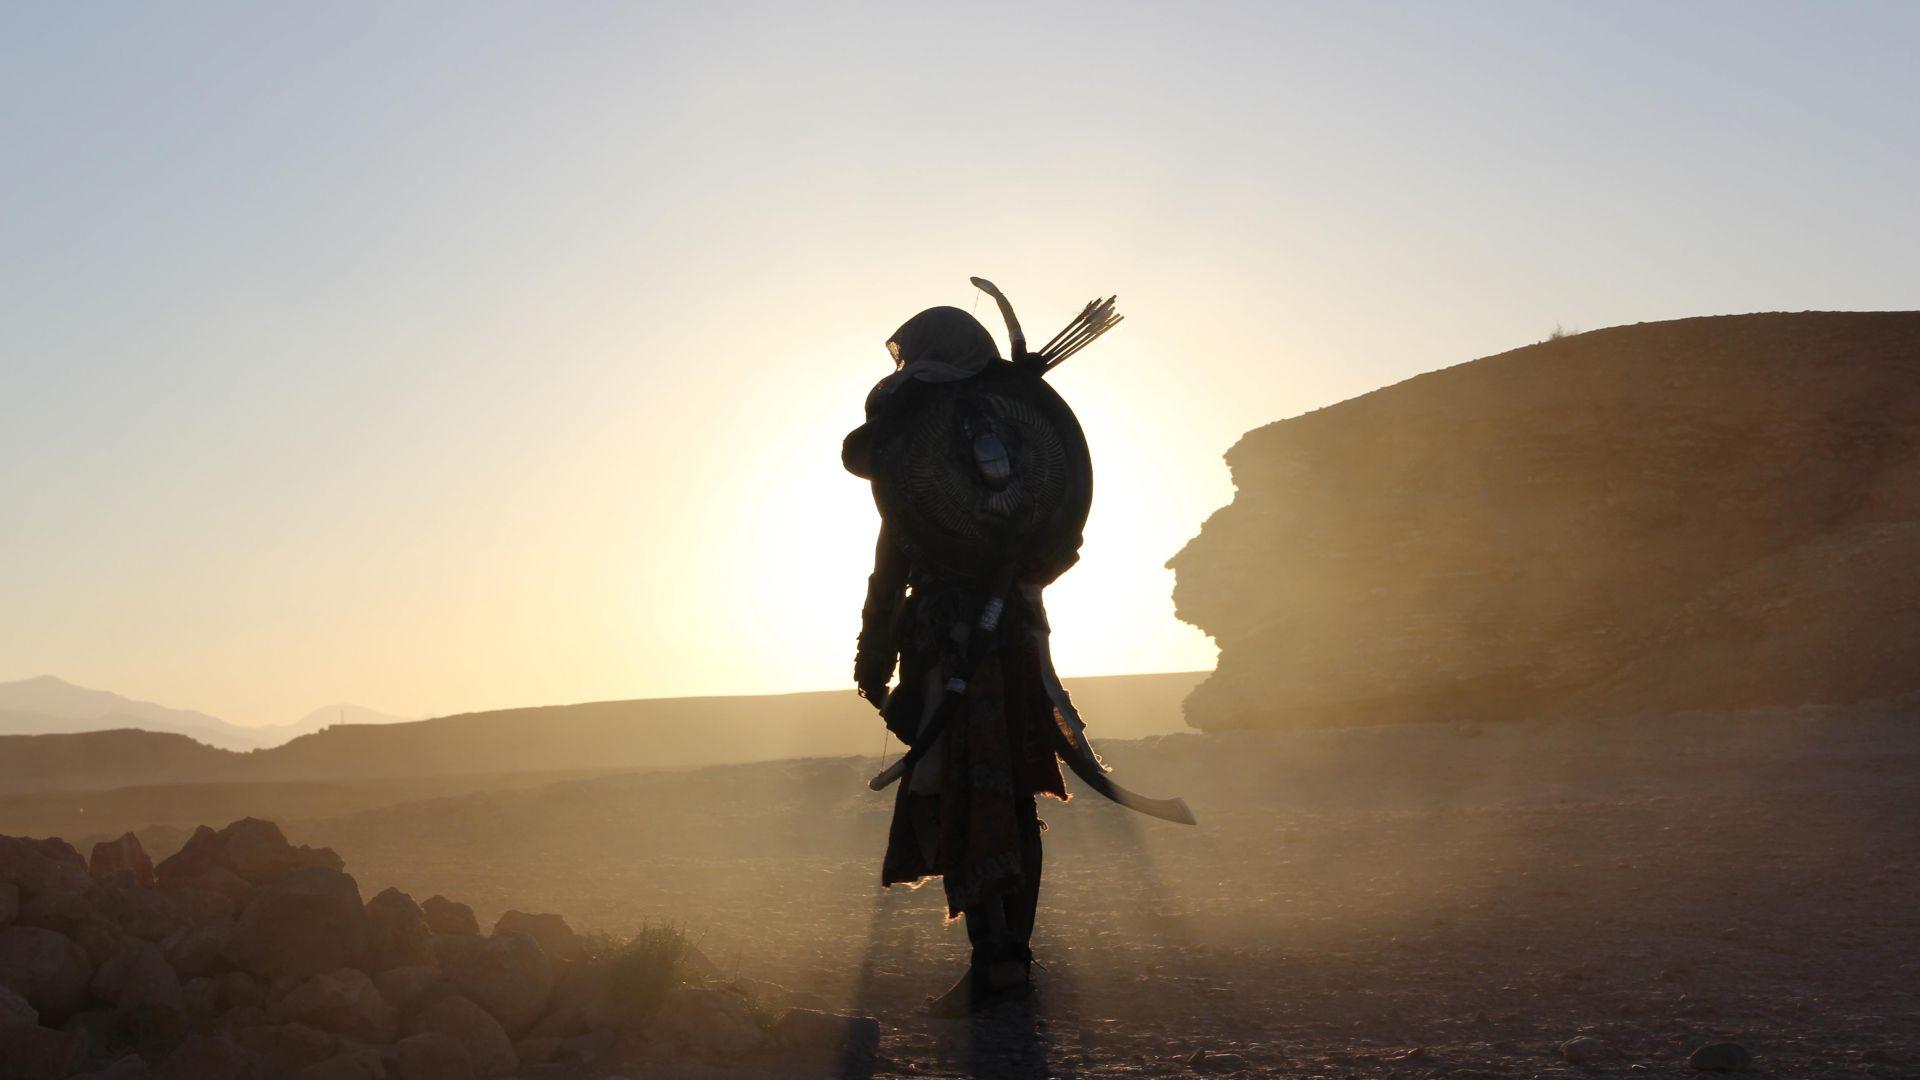 Desktop Wallpaper Assassin S Creed Origins Video Game 4k Hd